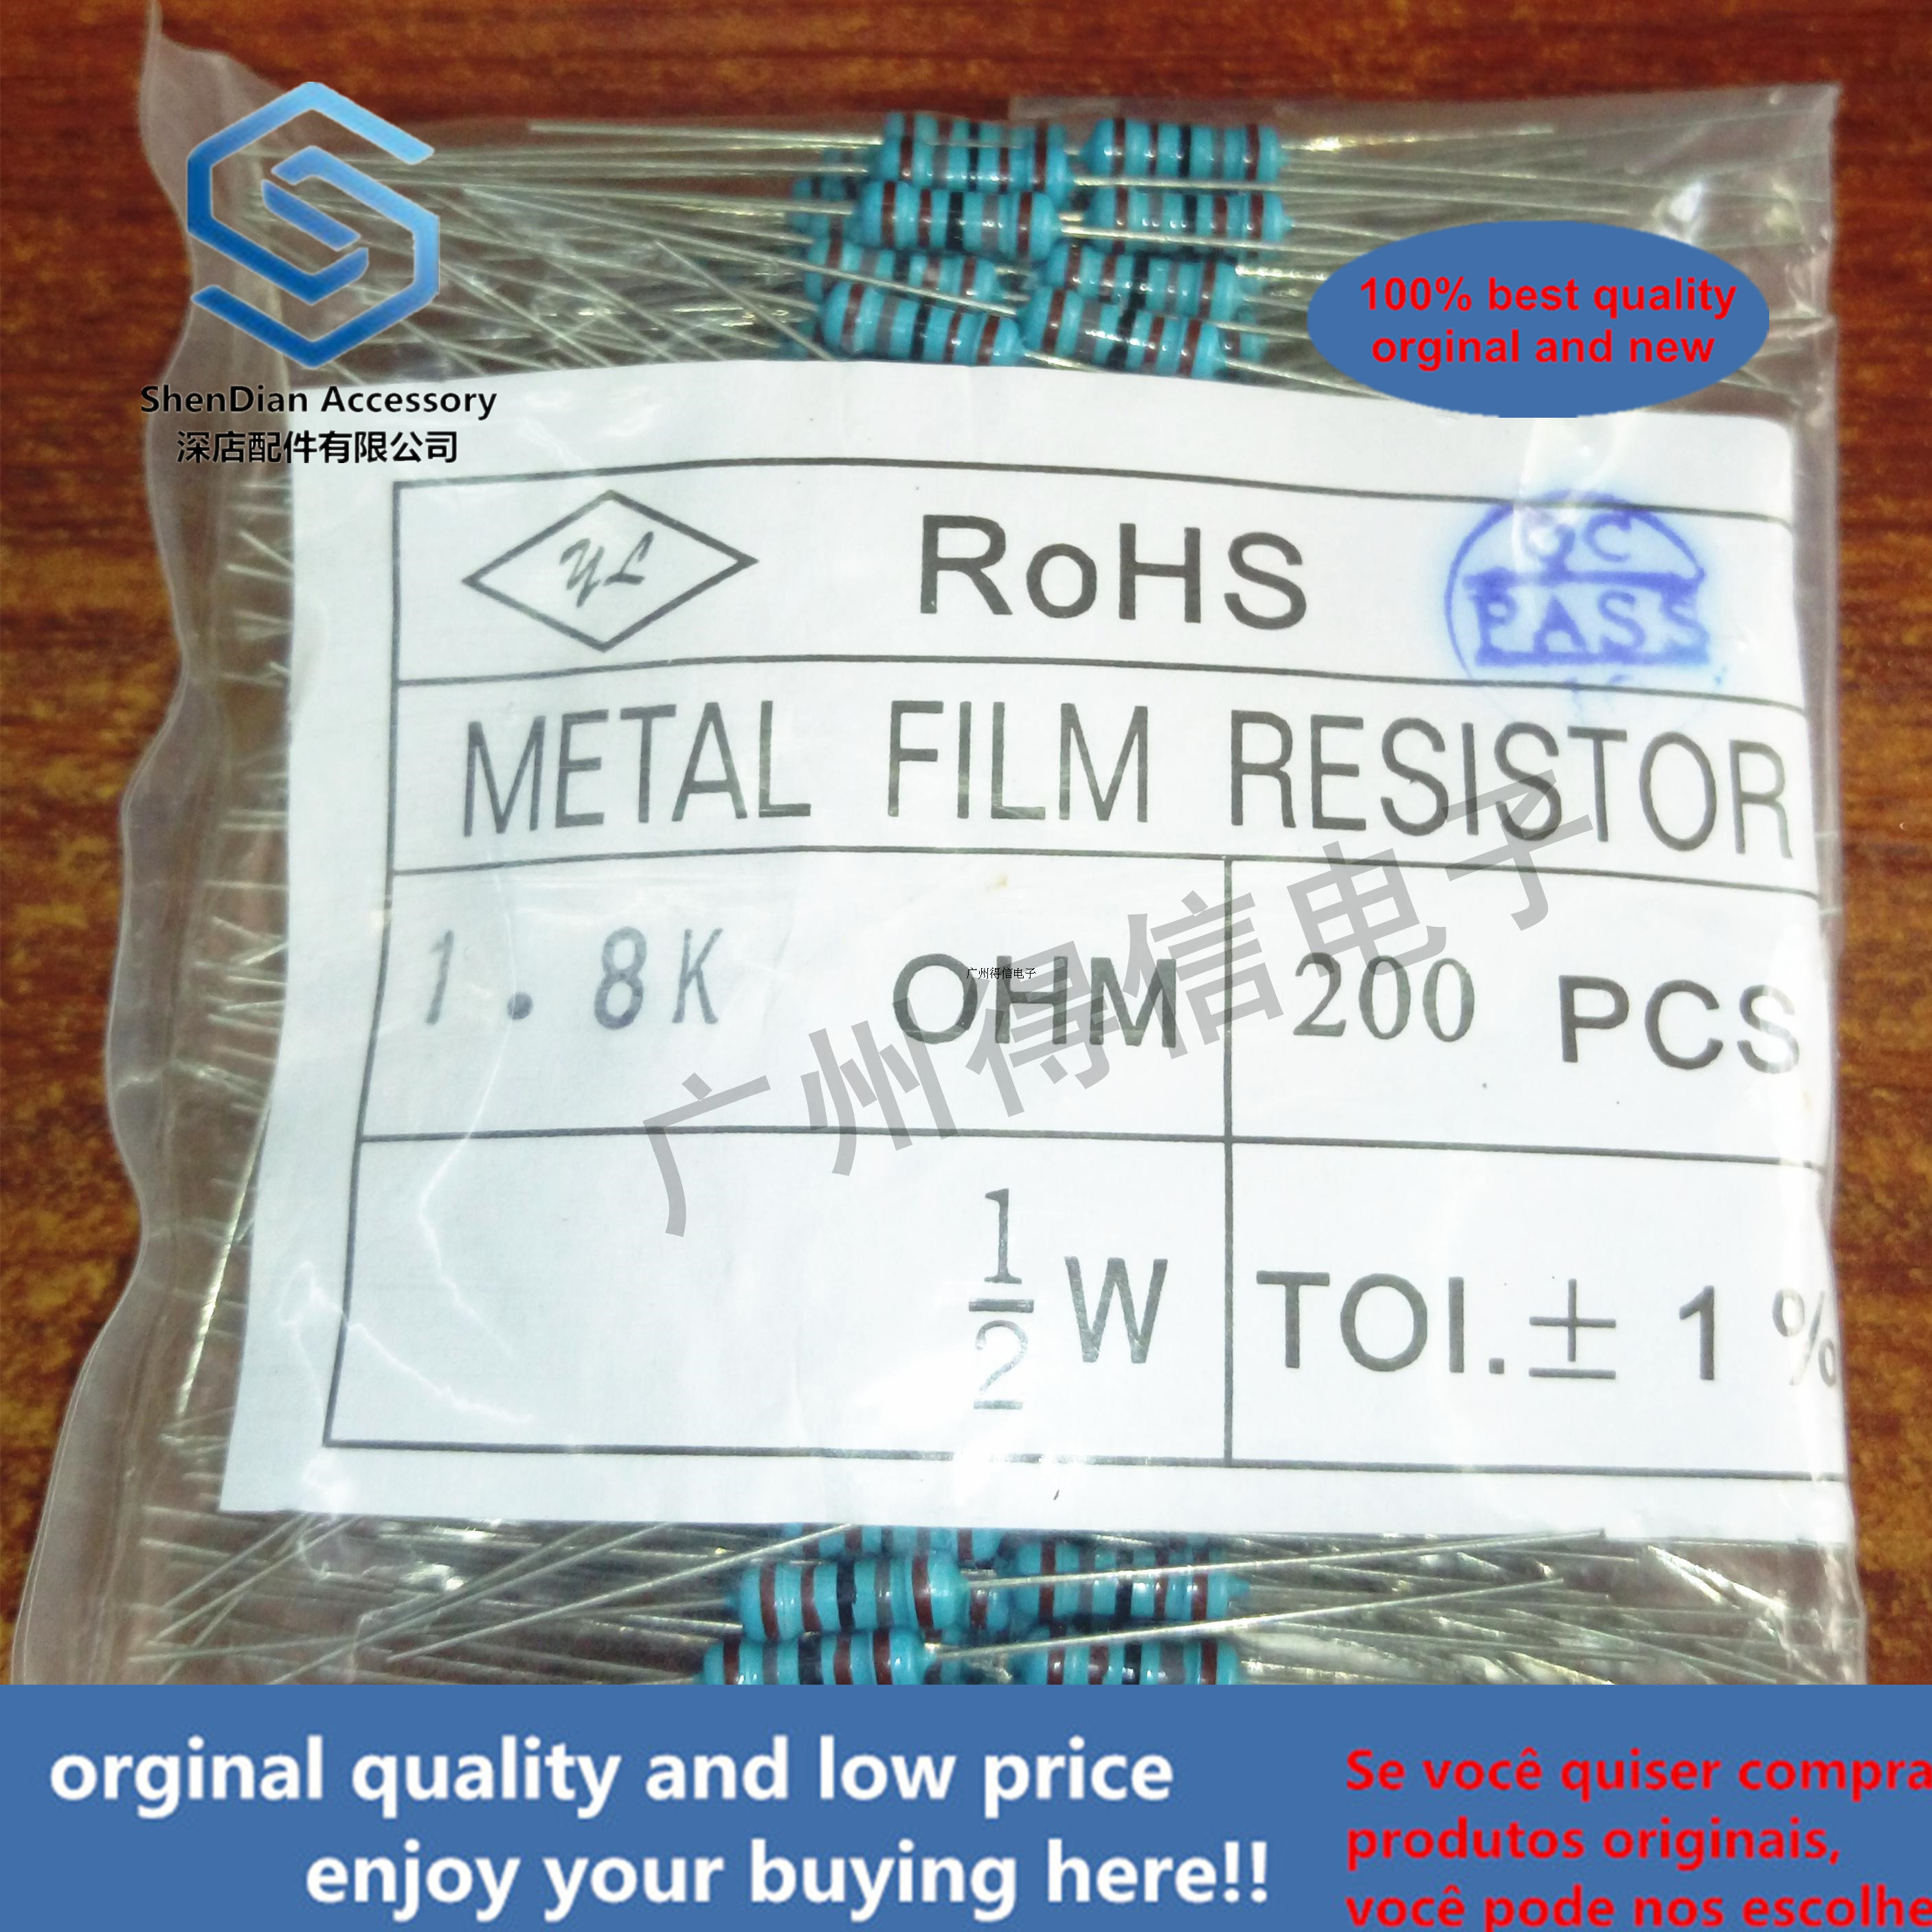 200pcs 1 / 2W 5.6K 5600 Euro 1% Brand New Metal Film Iron Feet Resistor Bag 200 Pcs Per Pack